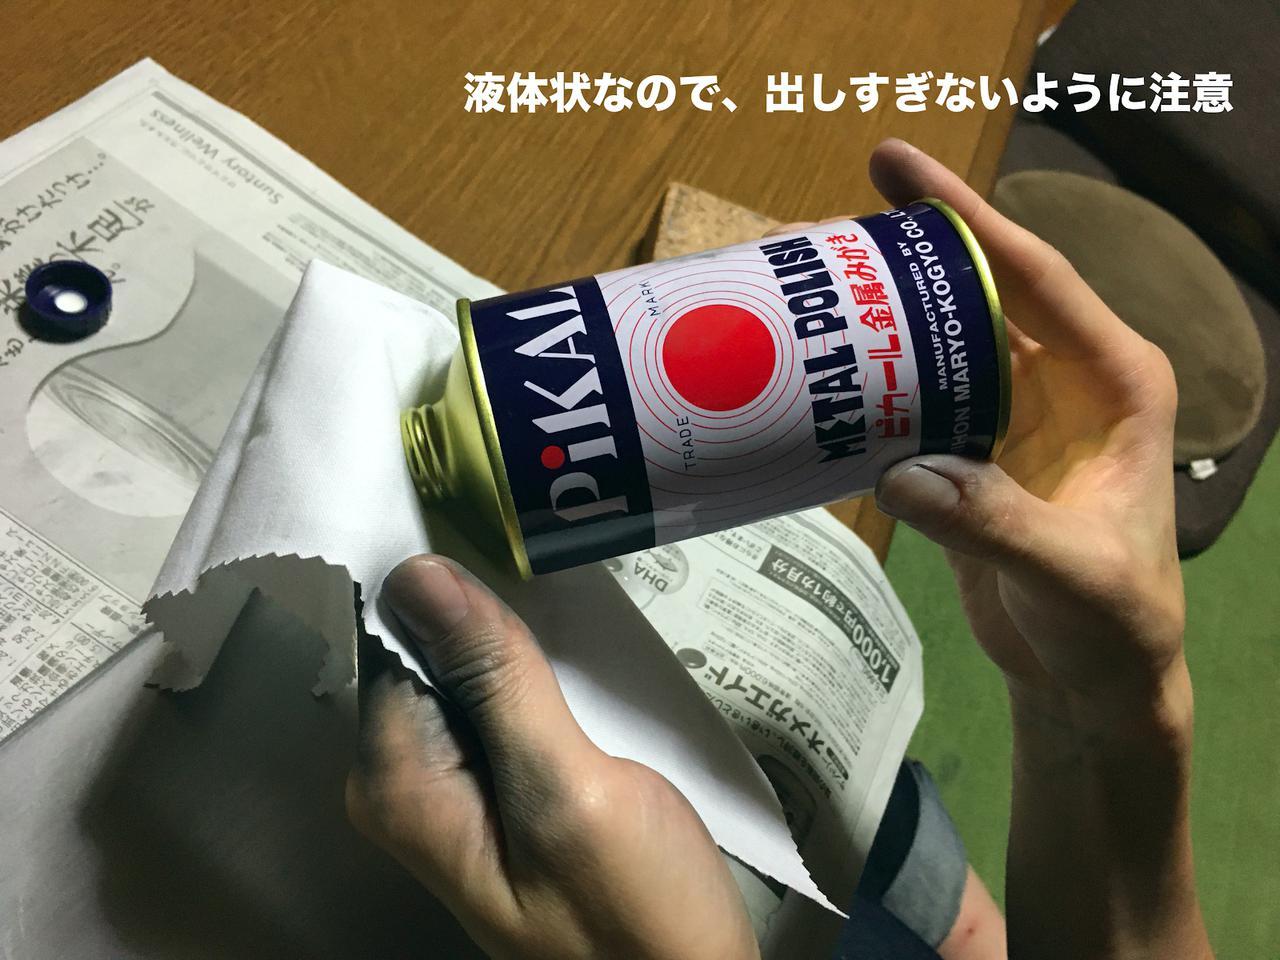 画像8: (筆者撮影)